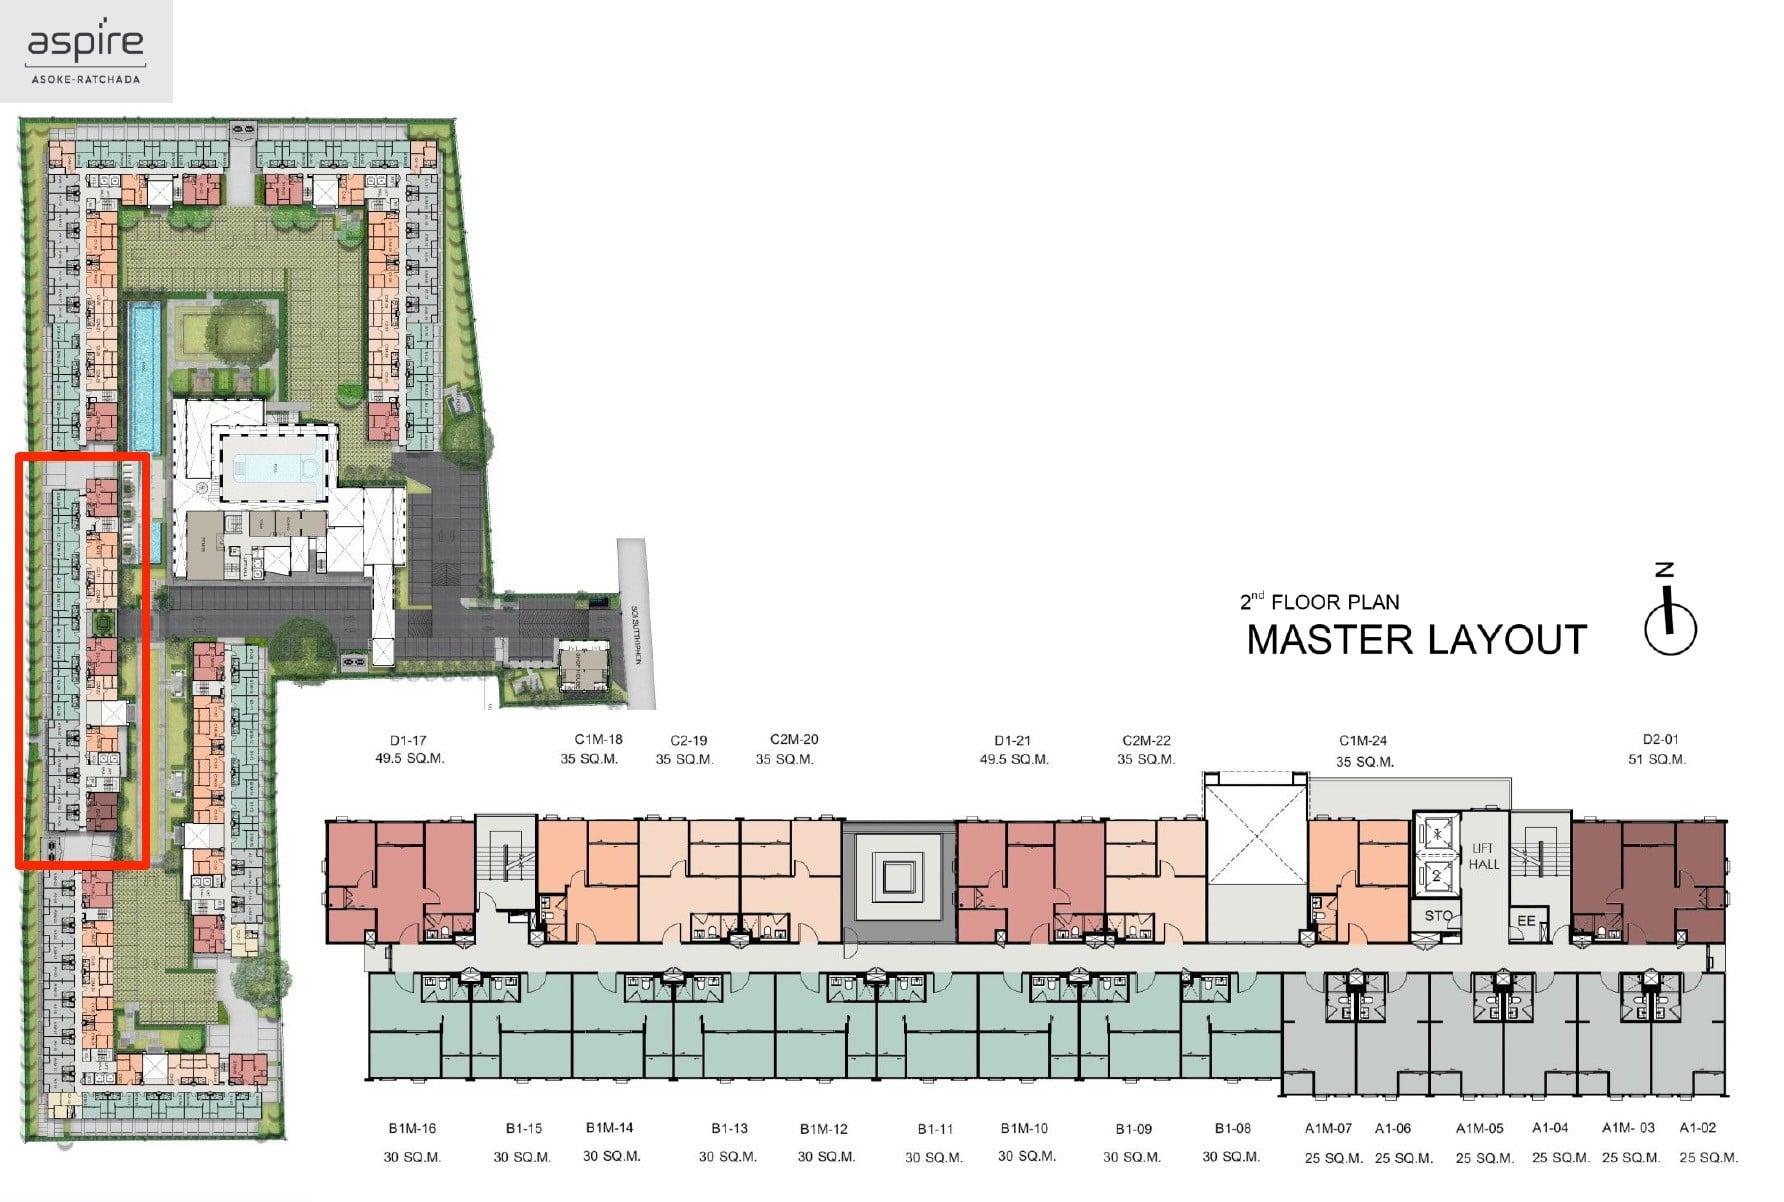 Aspire-Asoke-ratchada-Site-Plan-2nd floor